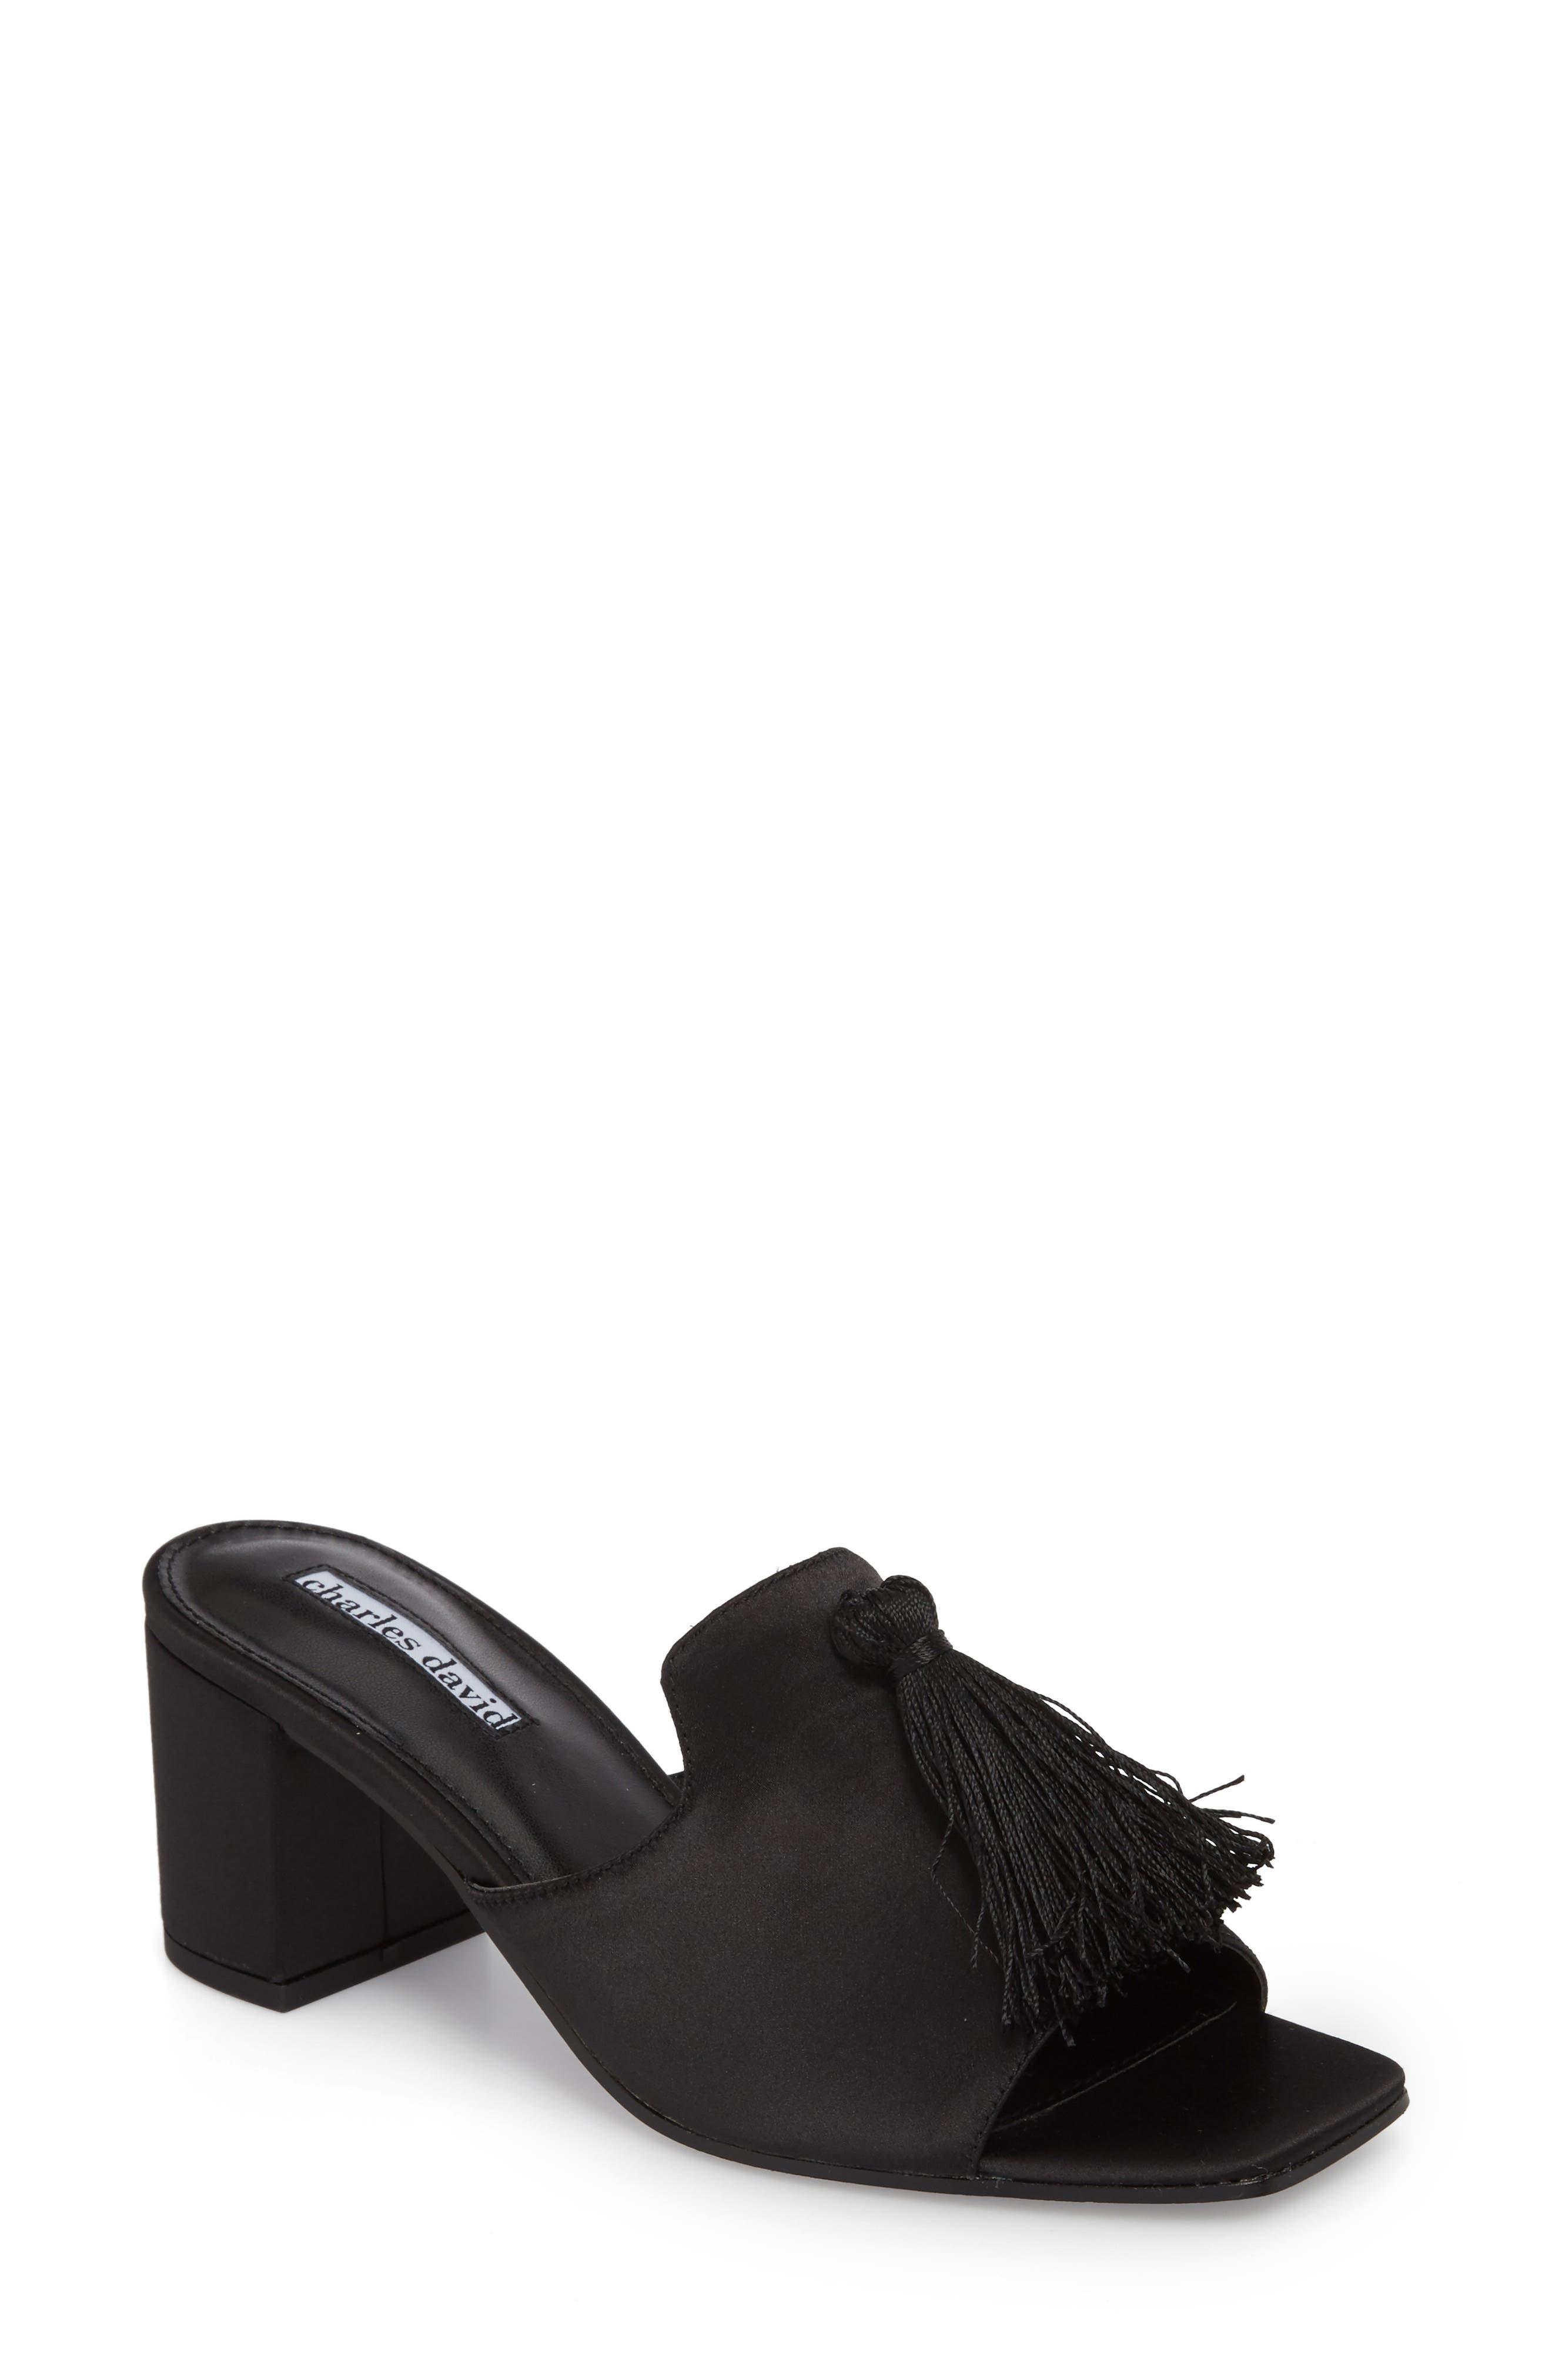 Chia Sandal,                         Main,                         color, BLACK SATIN